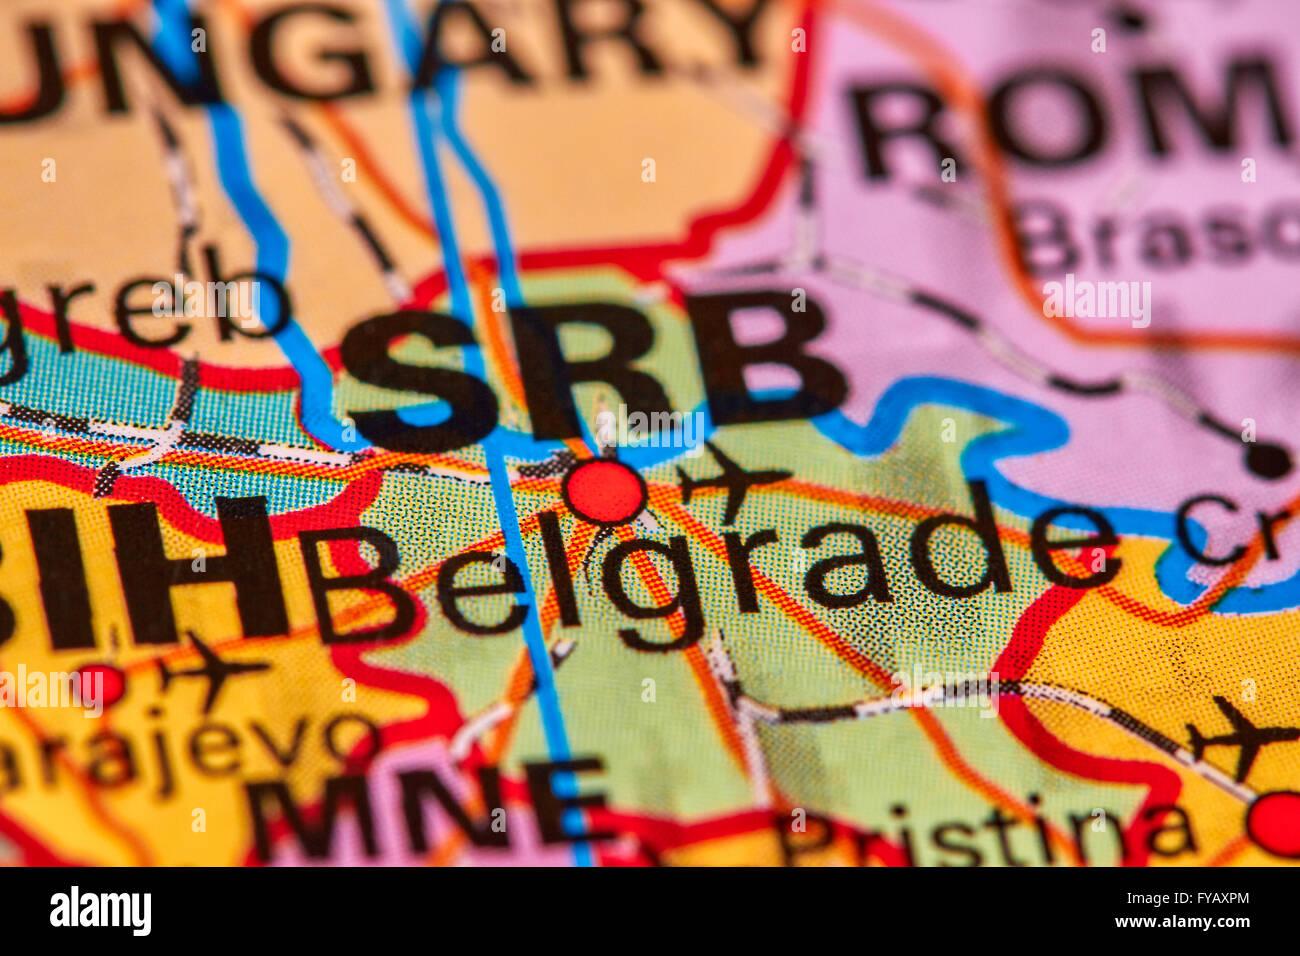 Belgrade, Capital City of Serbia on the World Map - Stock Image